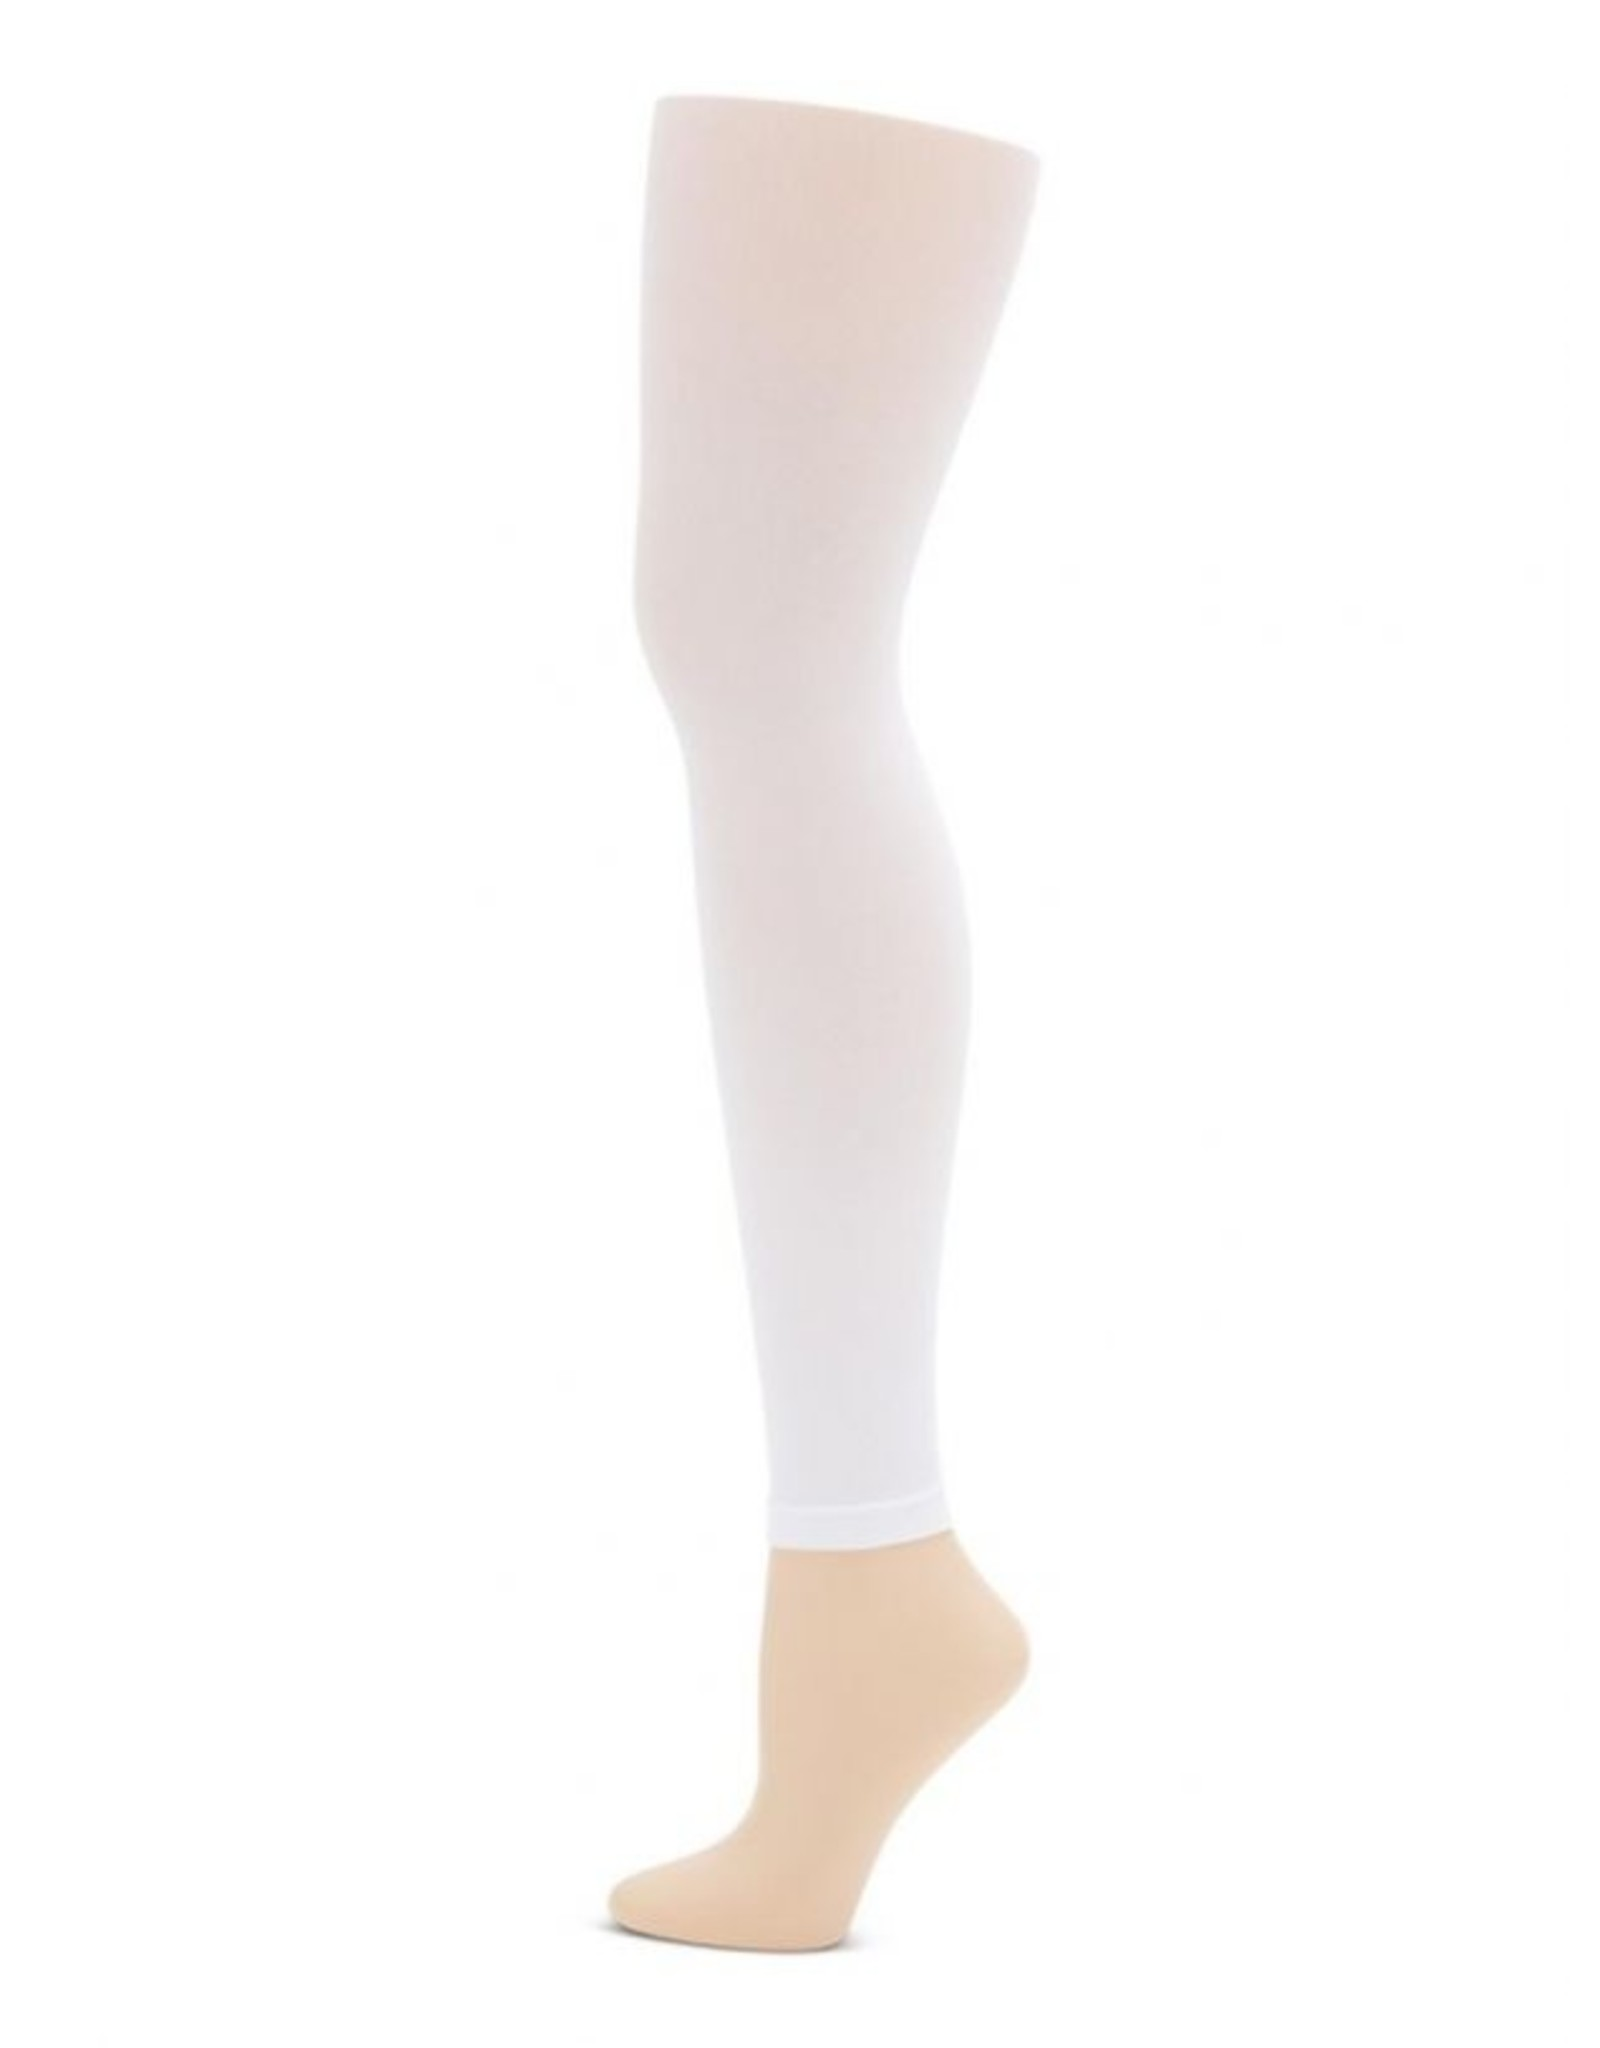 Capezio 1917 ADULT FOOTLESS TIGHT WHITE